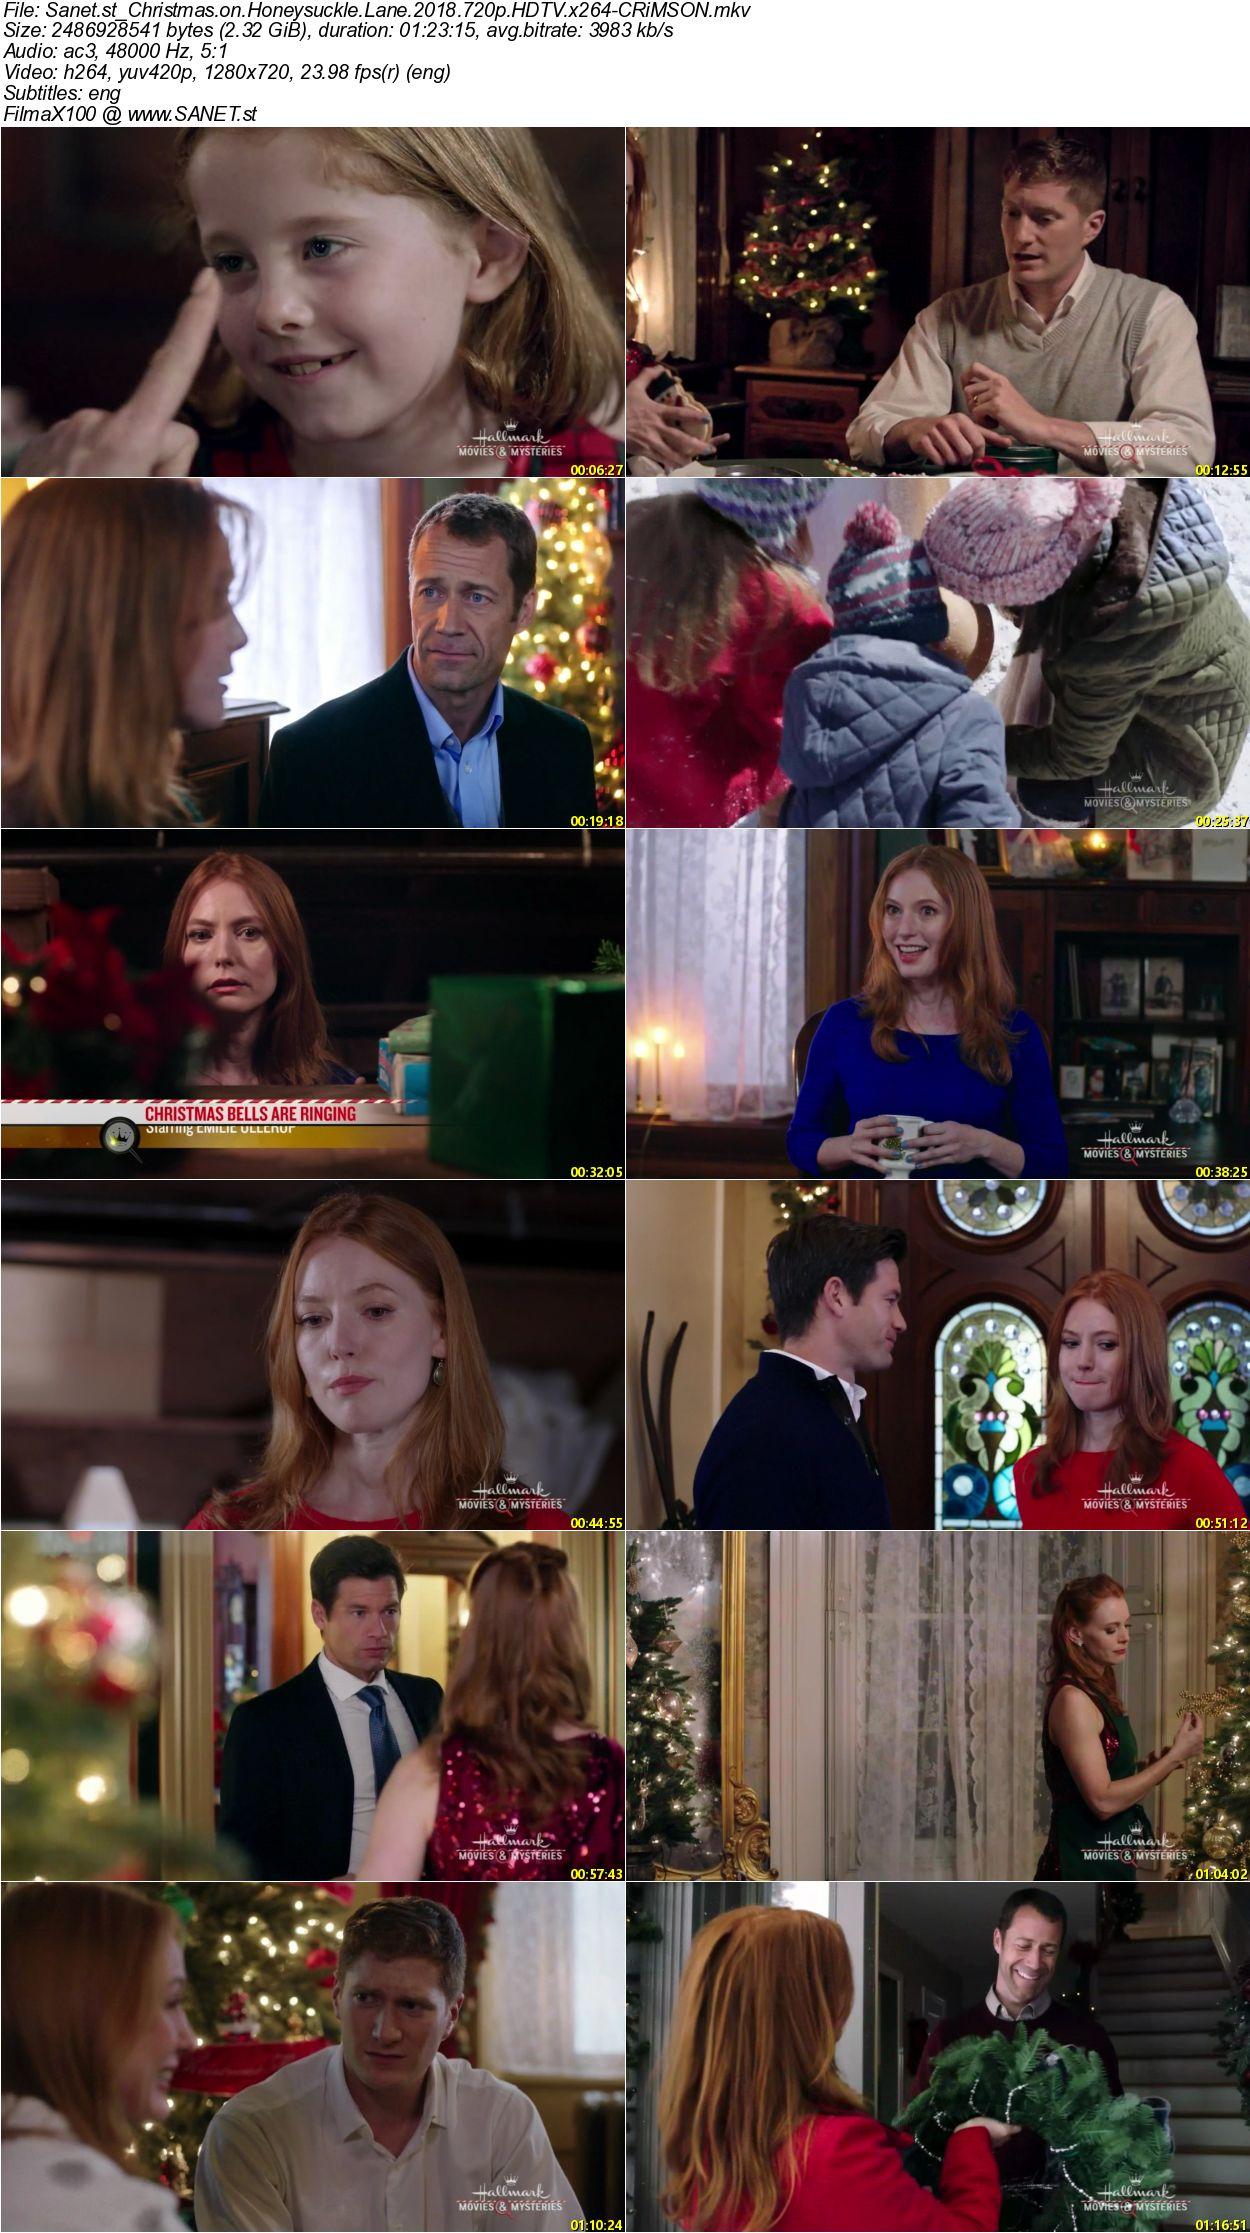 Download Christmas on Honeysuckle Lane 2018 720p HDTV x264-CRiMSON - SoftArchive